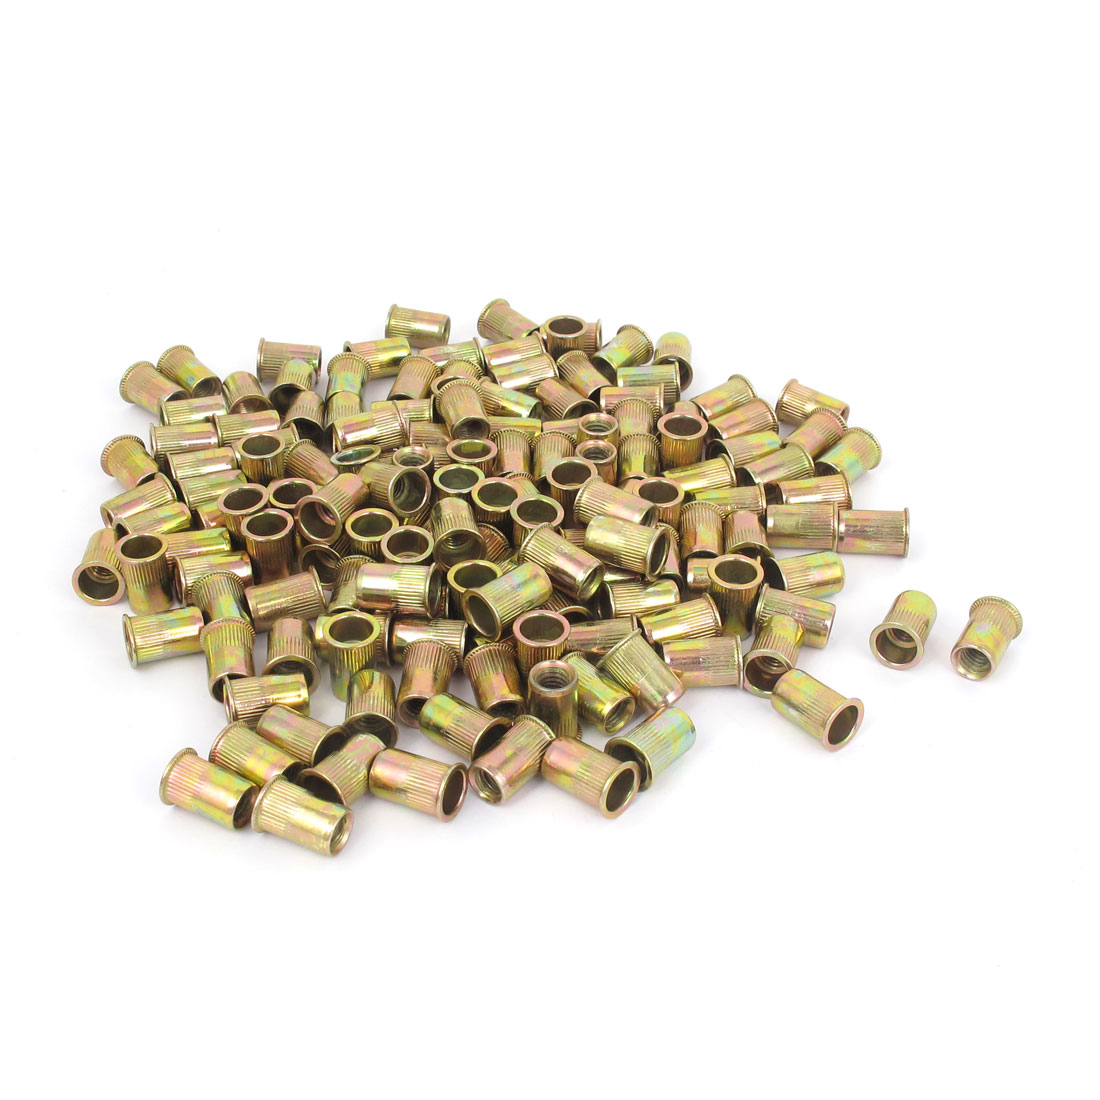 300 Pcs M6x14mm Zinc Plated Rivet Nut Insert Nutsert Blind Nuts Fastener